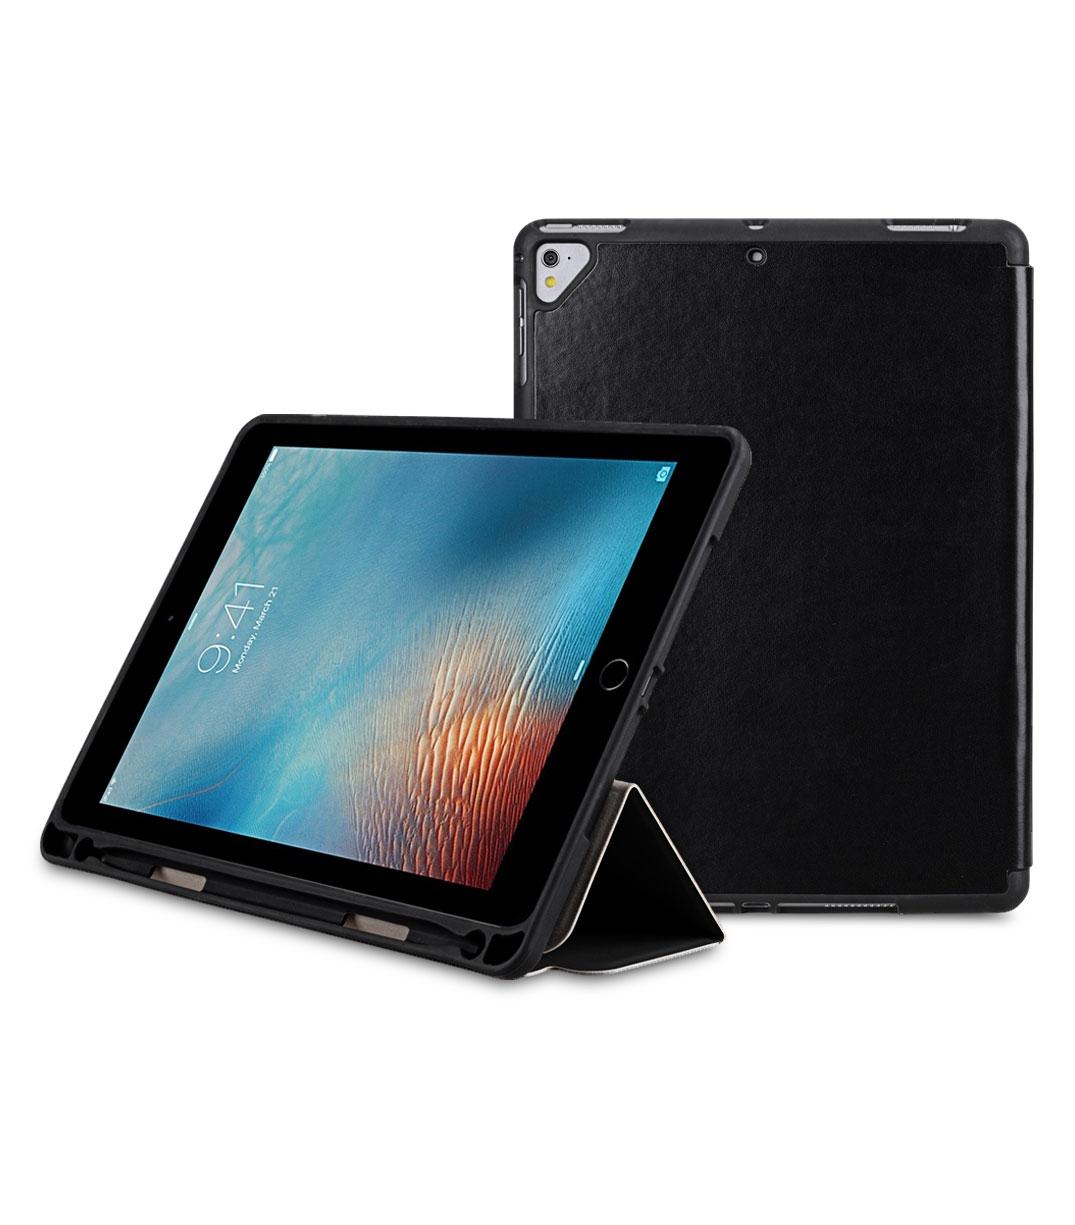 Чехол Melkco Mini PU Cases для iPad Air/Air 2/Pro 9.7/new iPad 2017/2018 Bl